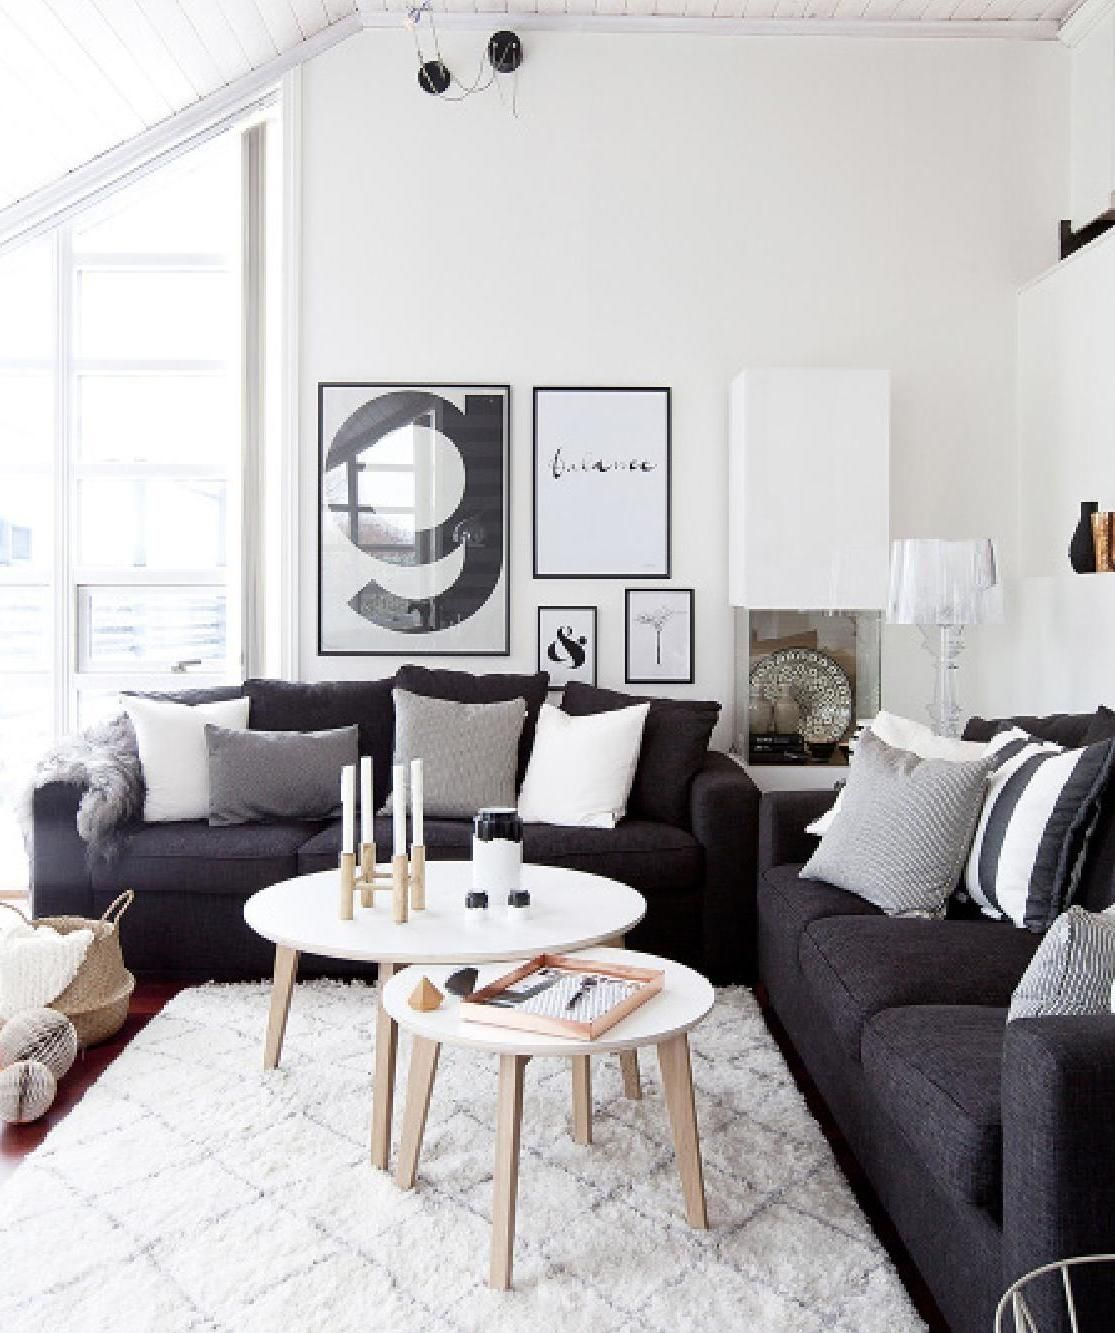 Dark Grey Sofa Living Room Ideas Dark Grey Sofa Living Room Ideas Nibhjemme 6 Living Rooms Room And Interiors With Images Dark Grey Couch Living Room Grey Couch Living Room Grey